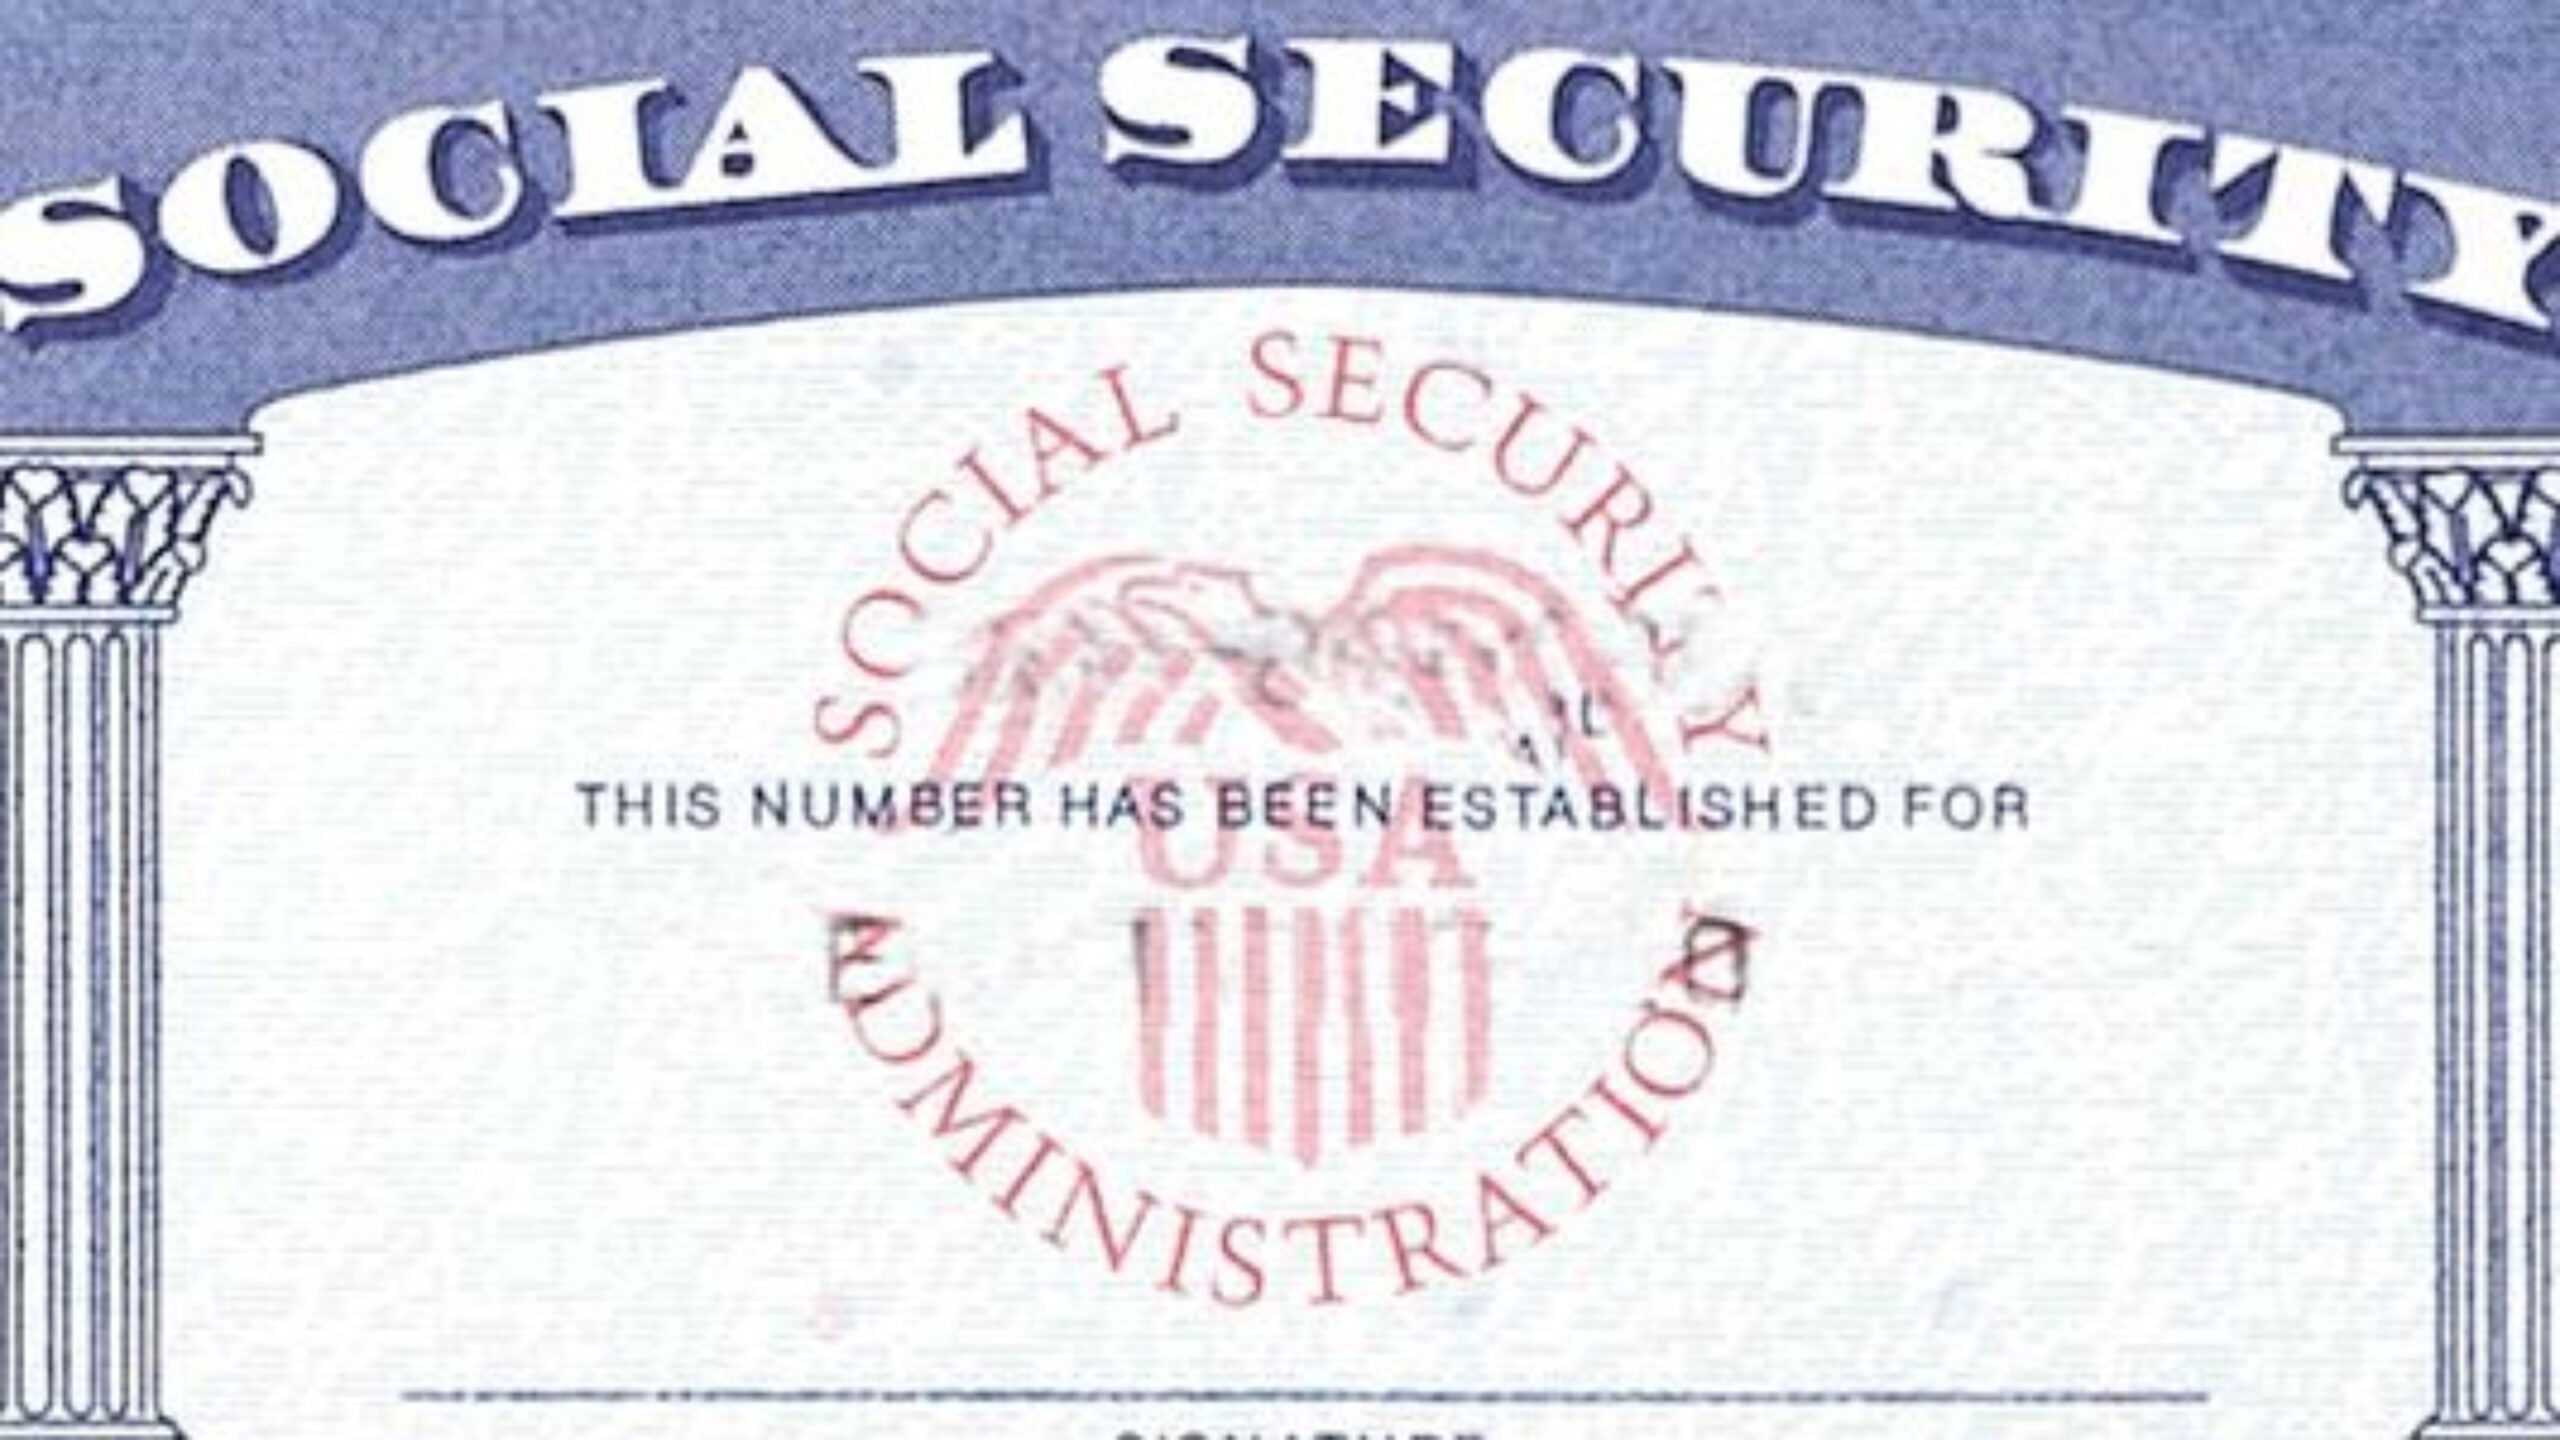 7 Social Security Card Template Psd Images - Social Security With Regard To Social Security Card Template Pdf